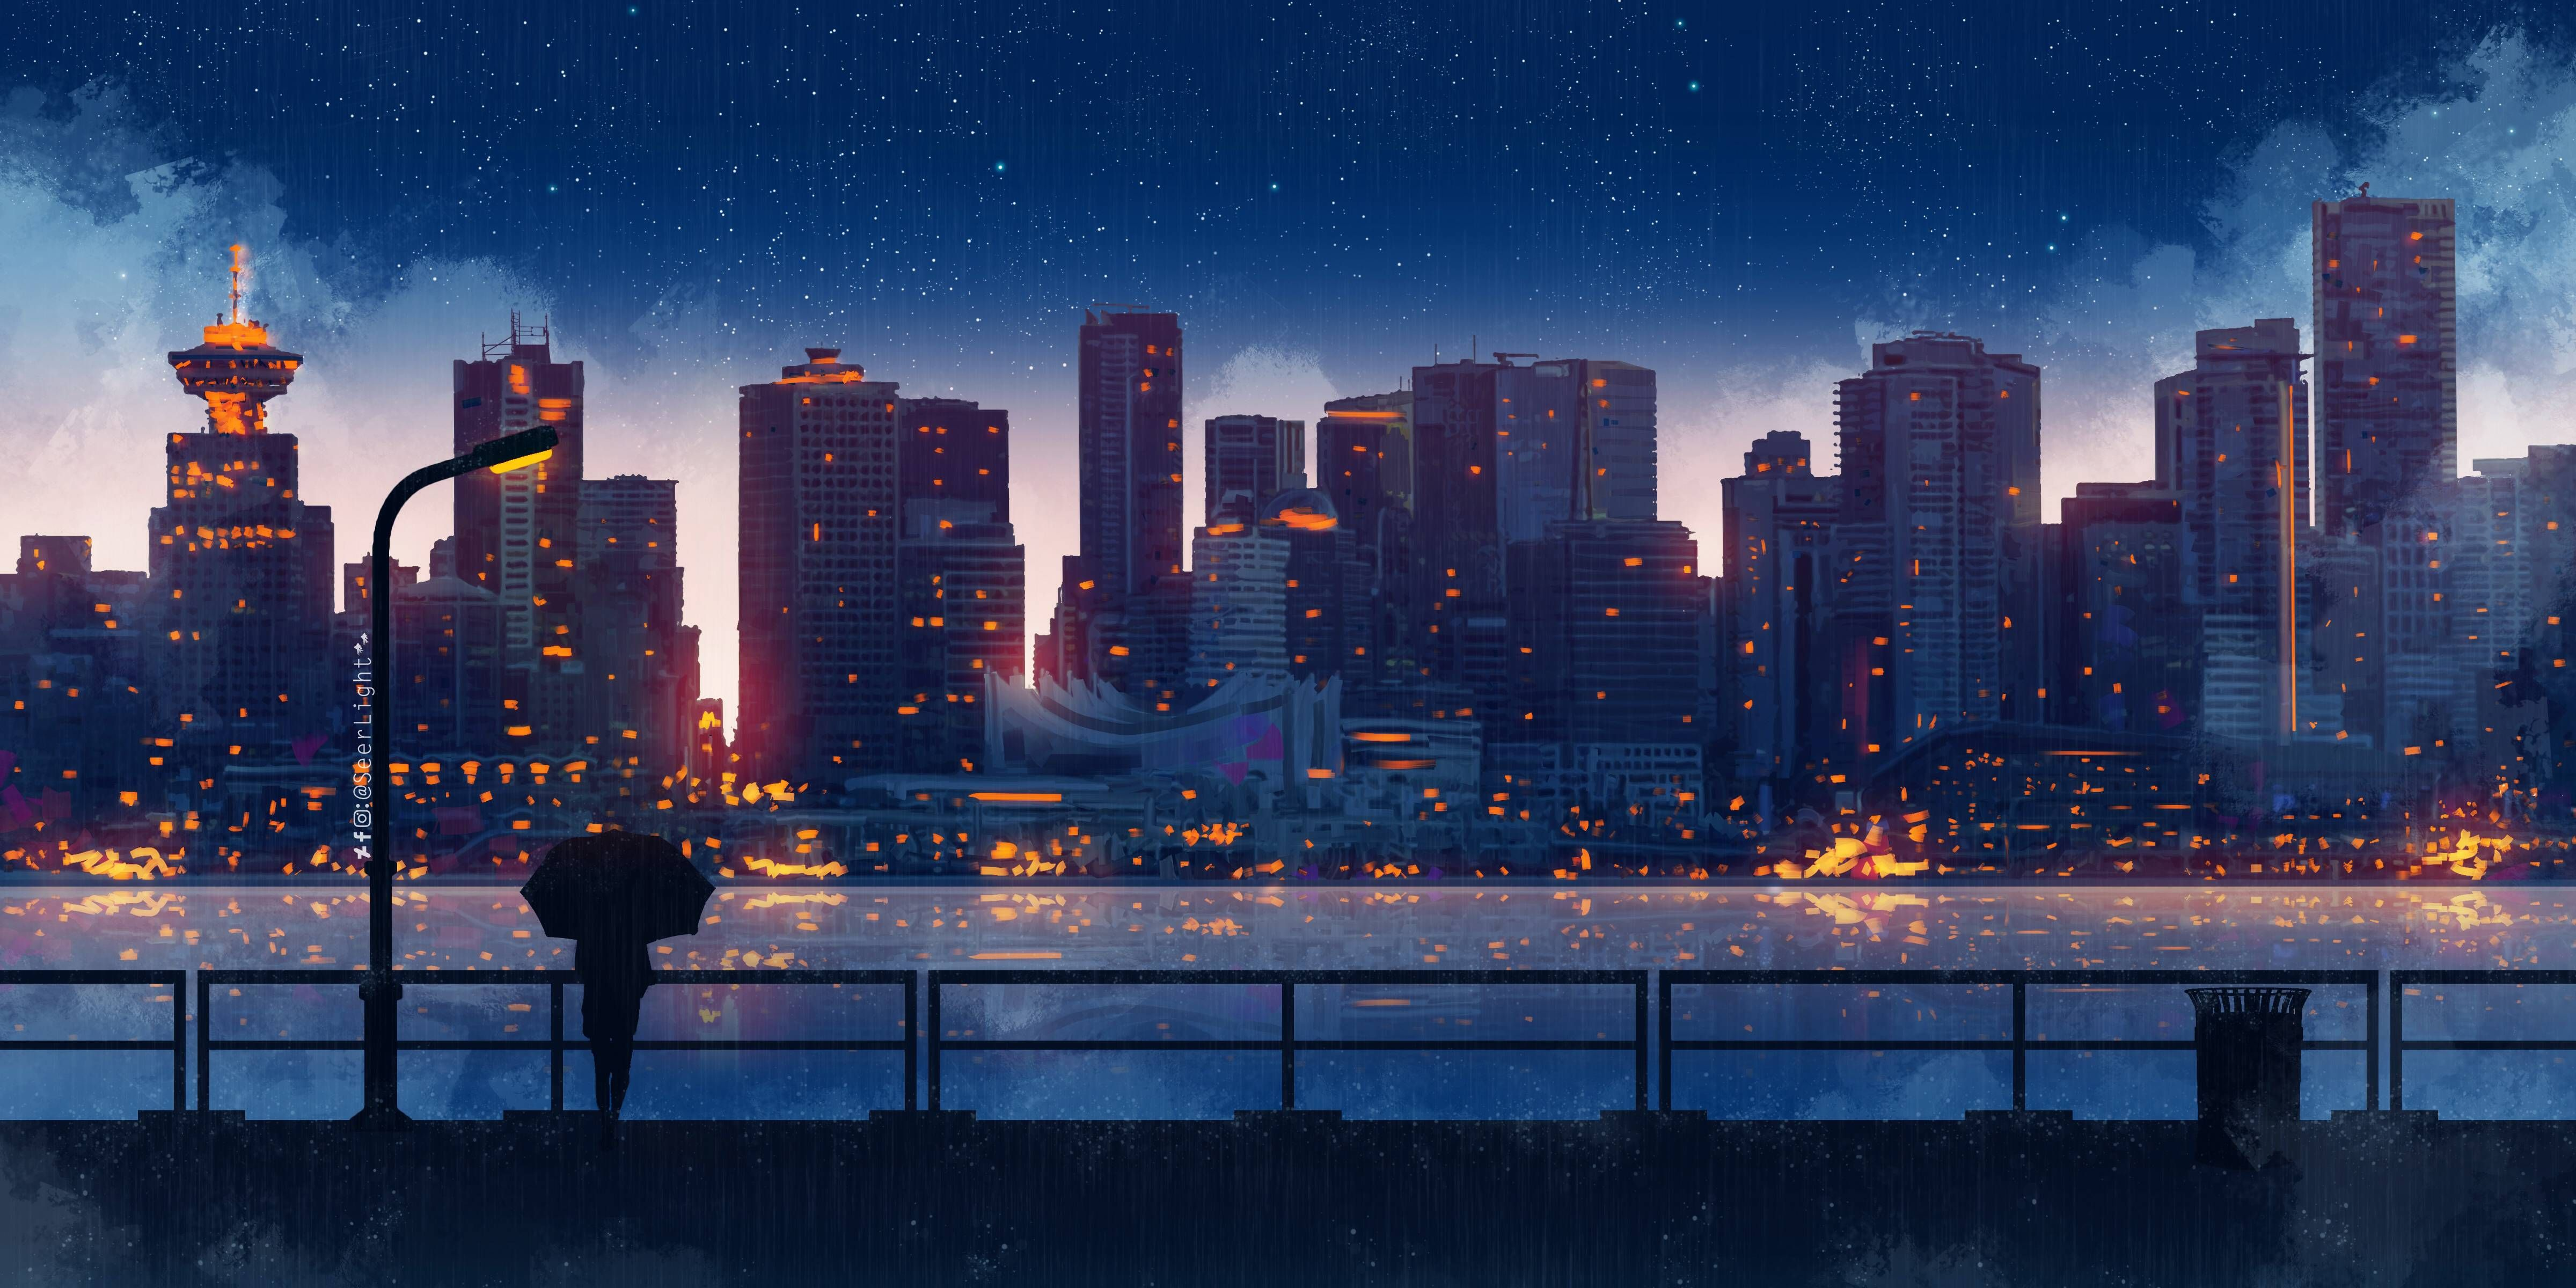 A Rainy Night 4800x2400 Anime City Night Scenery Anime Scenery Wallpaper